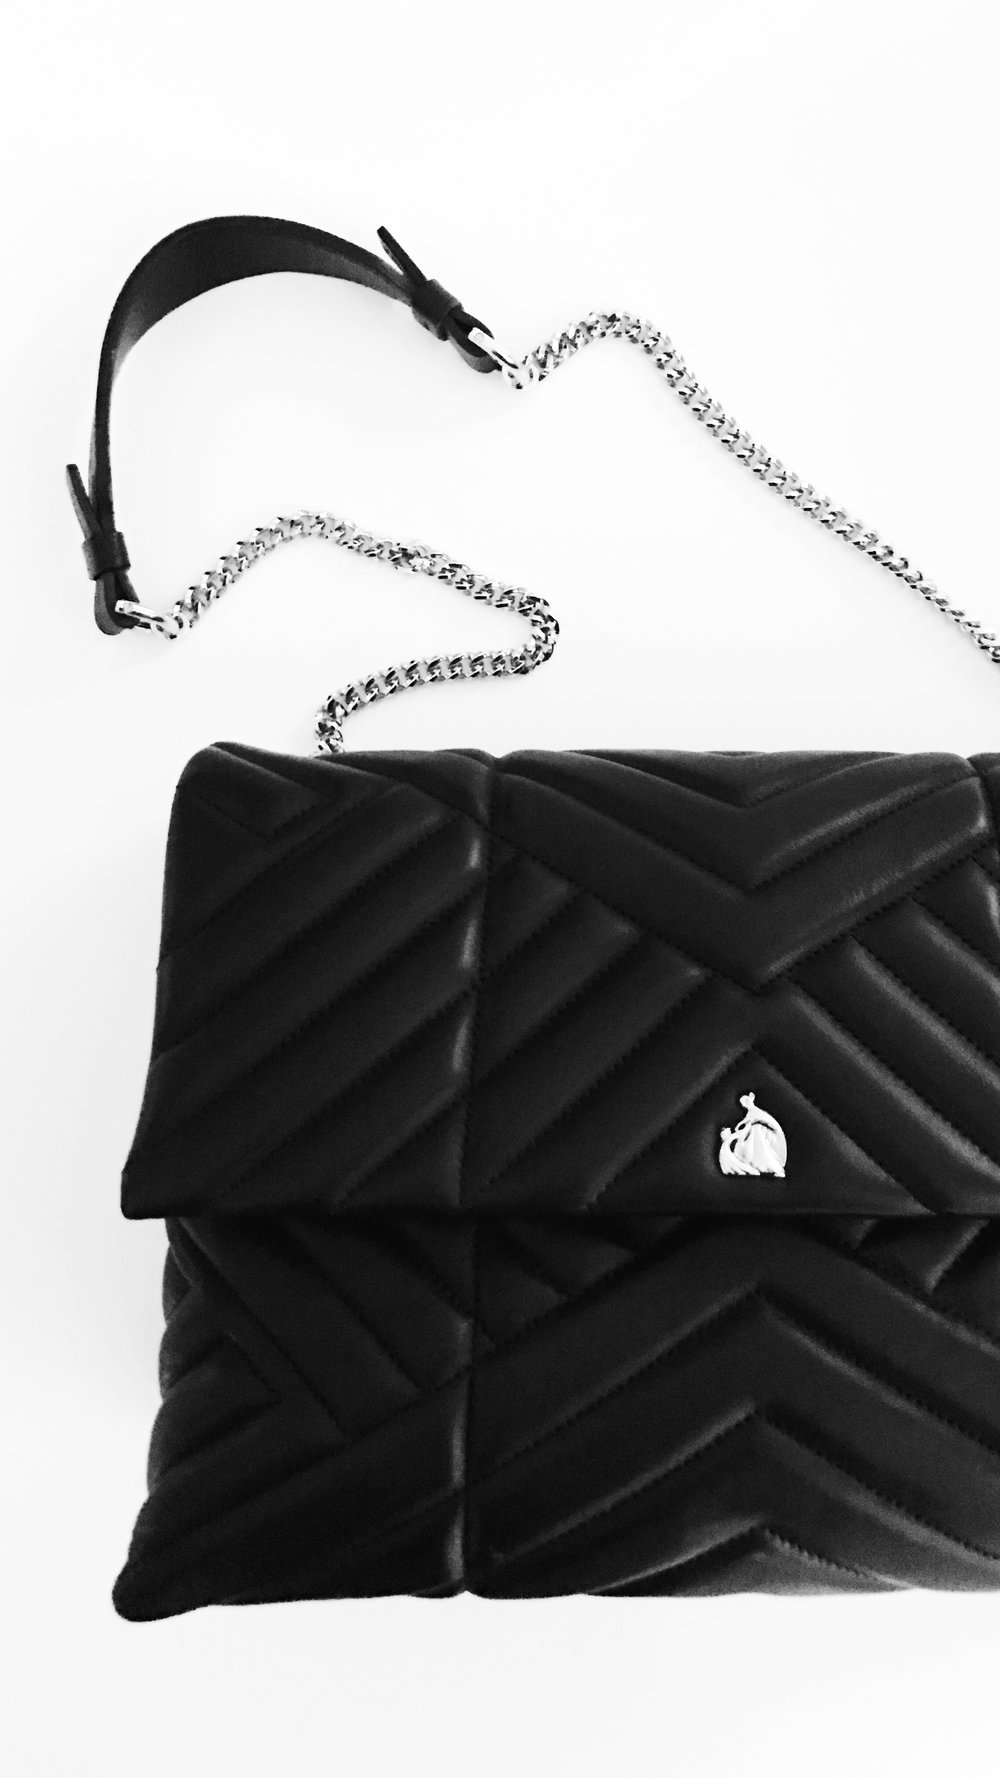 Bag:  Lanvin